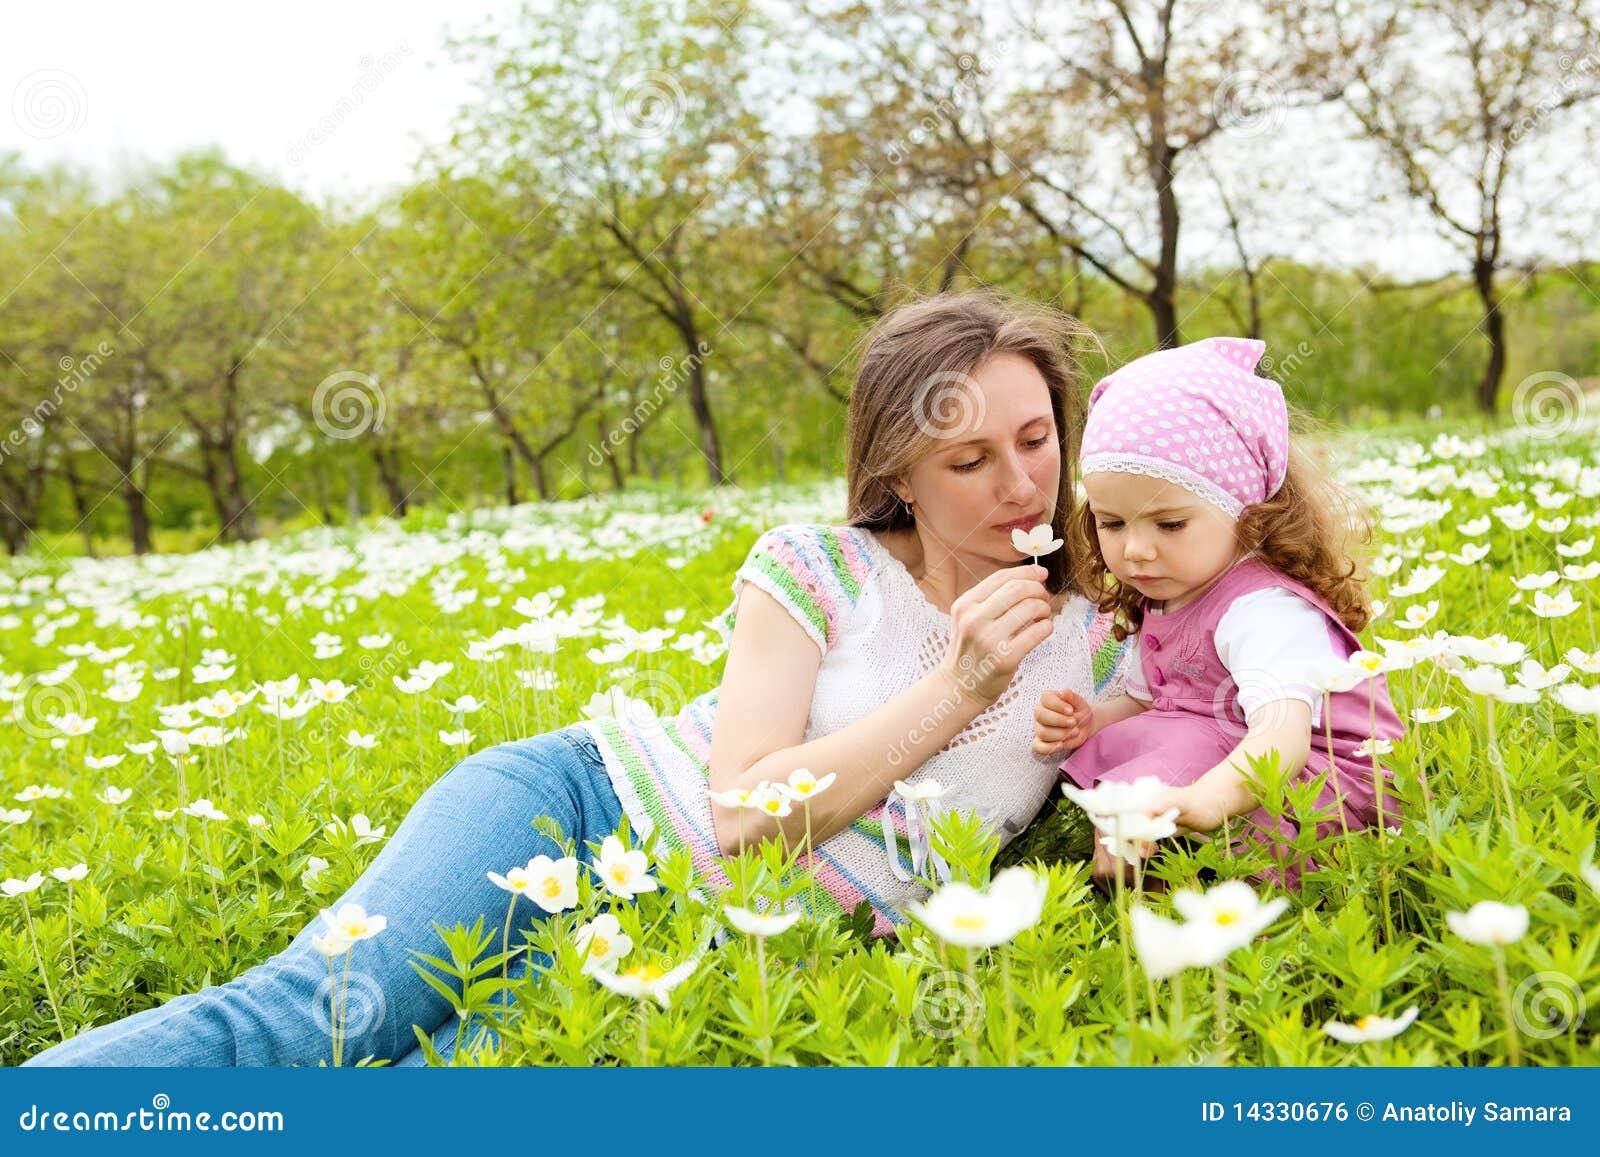 sentir une fleur photo stock image du fleurs vert mensonge 14330676. Black Bedroom Furniture Sets. Home Design Ideas